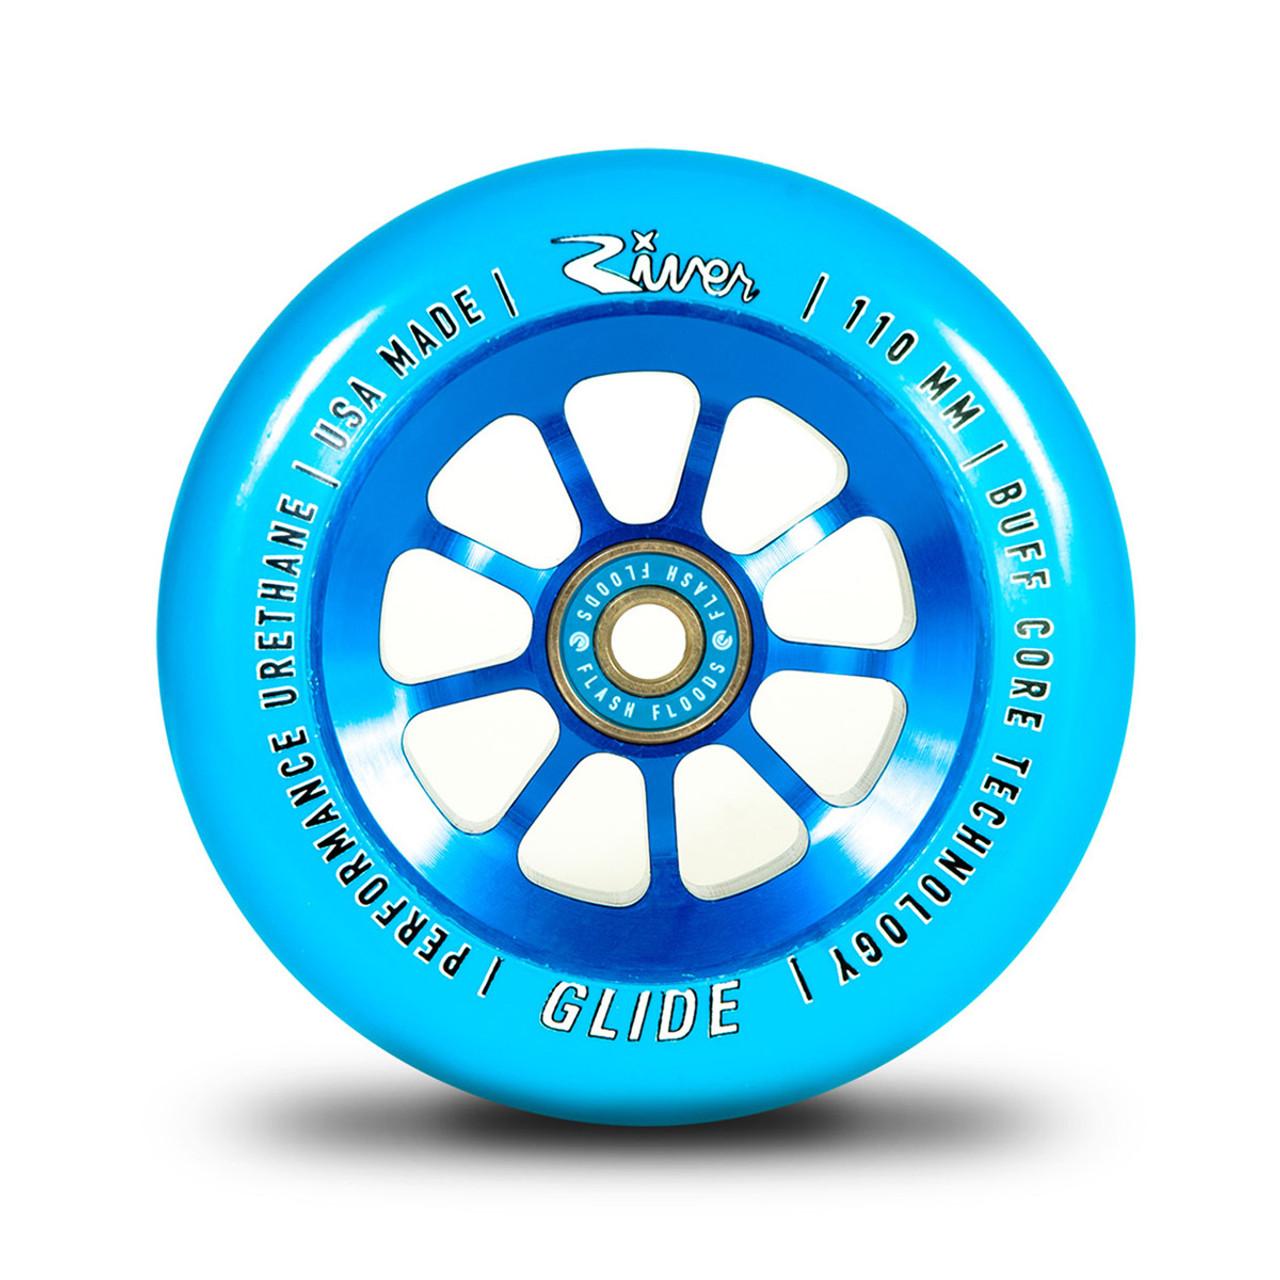 River Rapid Wheels Reece Doezema Signature